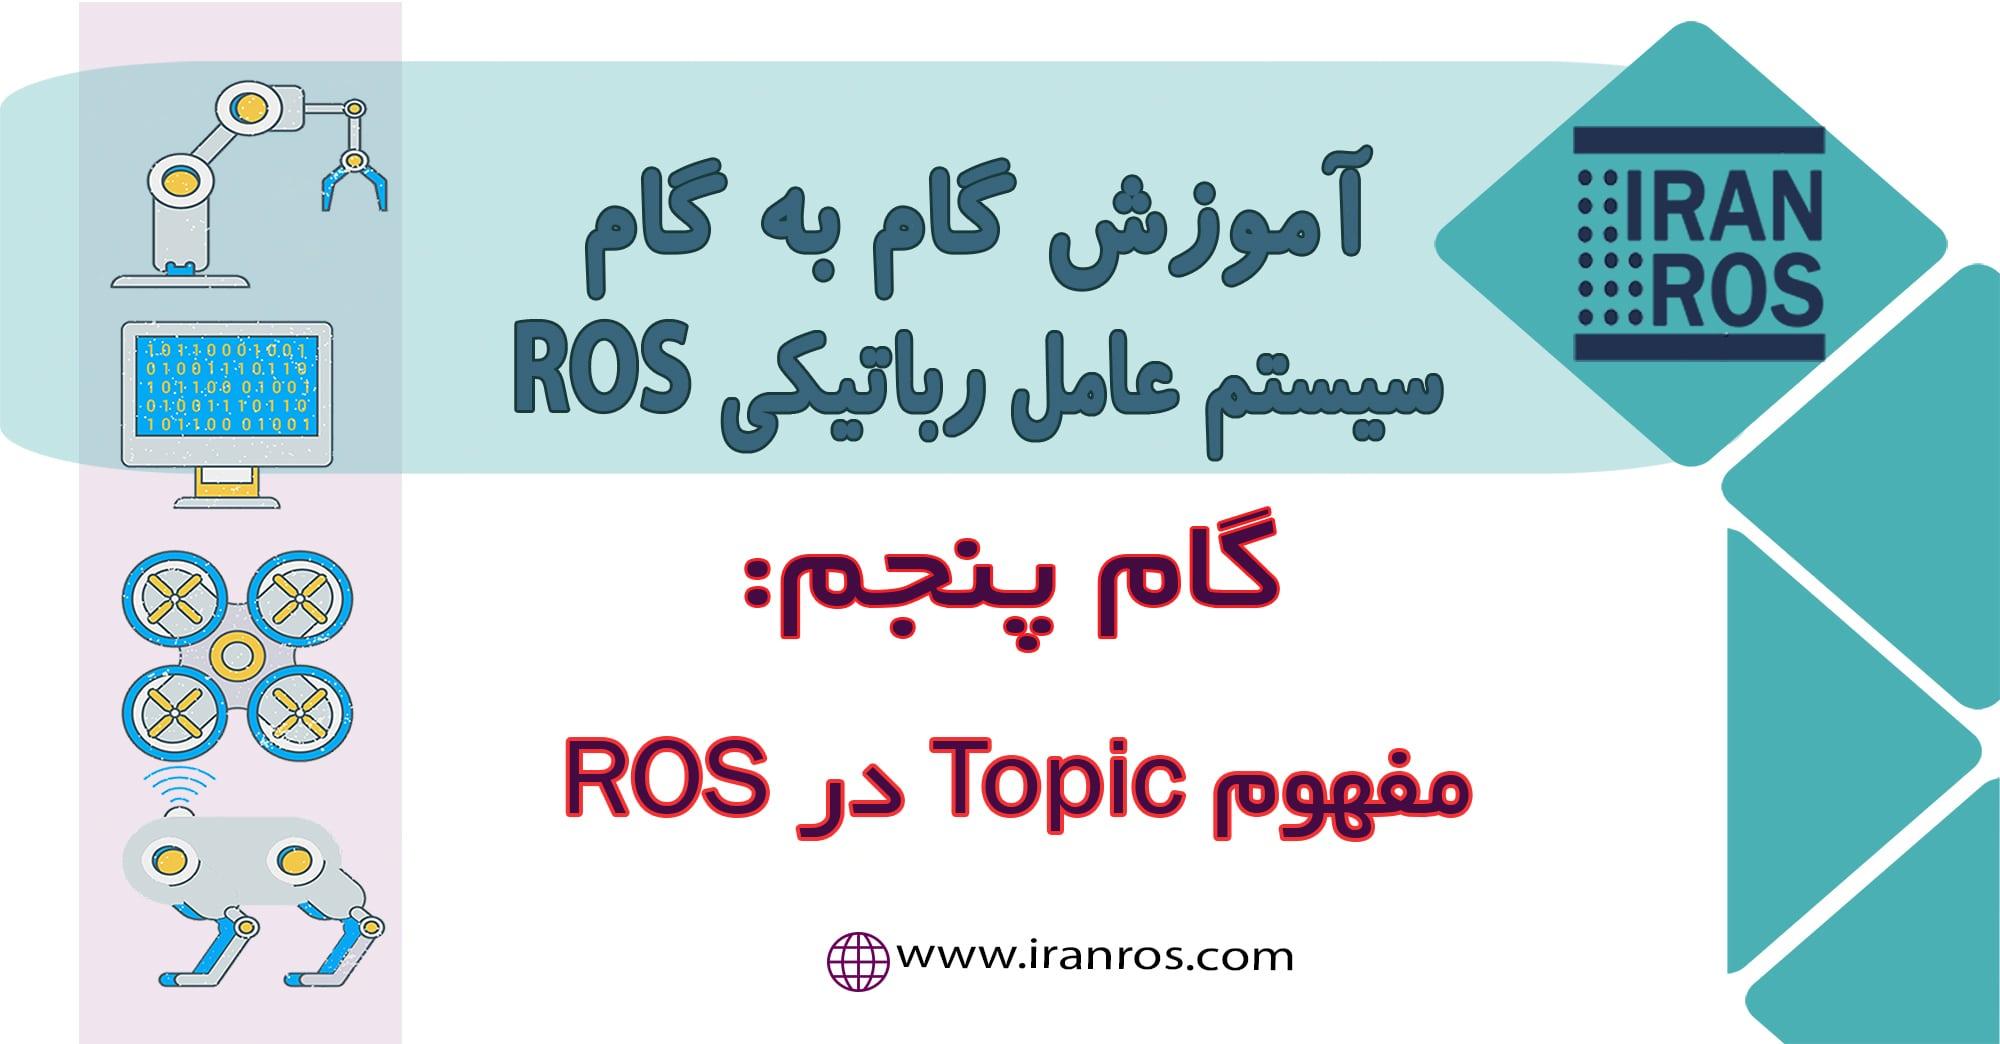 مفهوم Topic در ROS